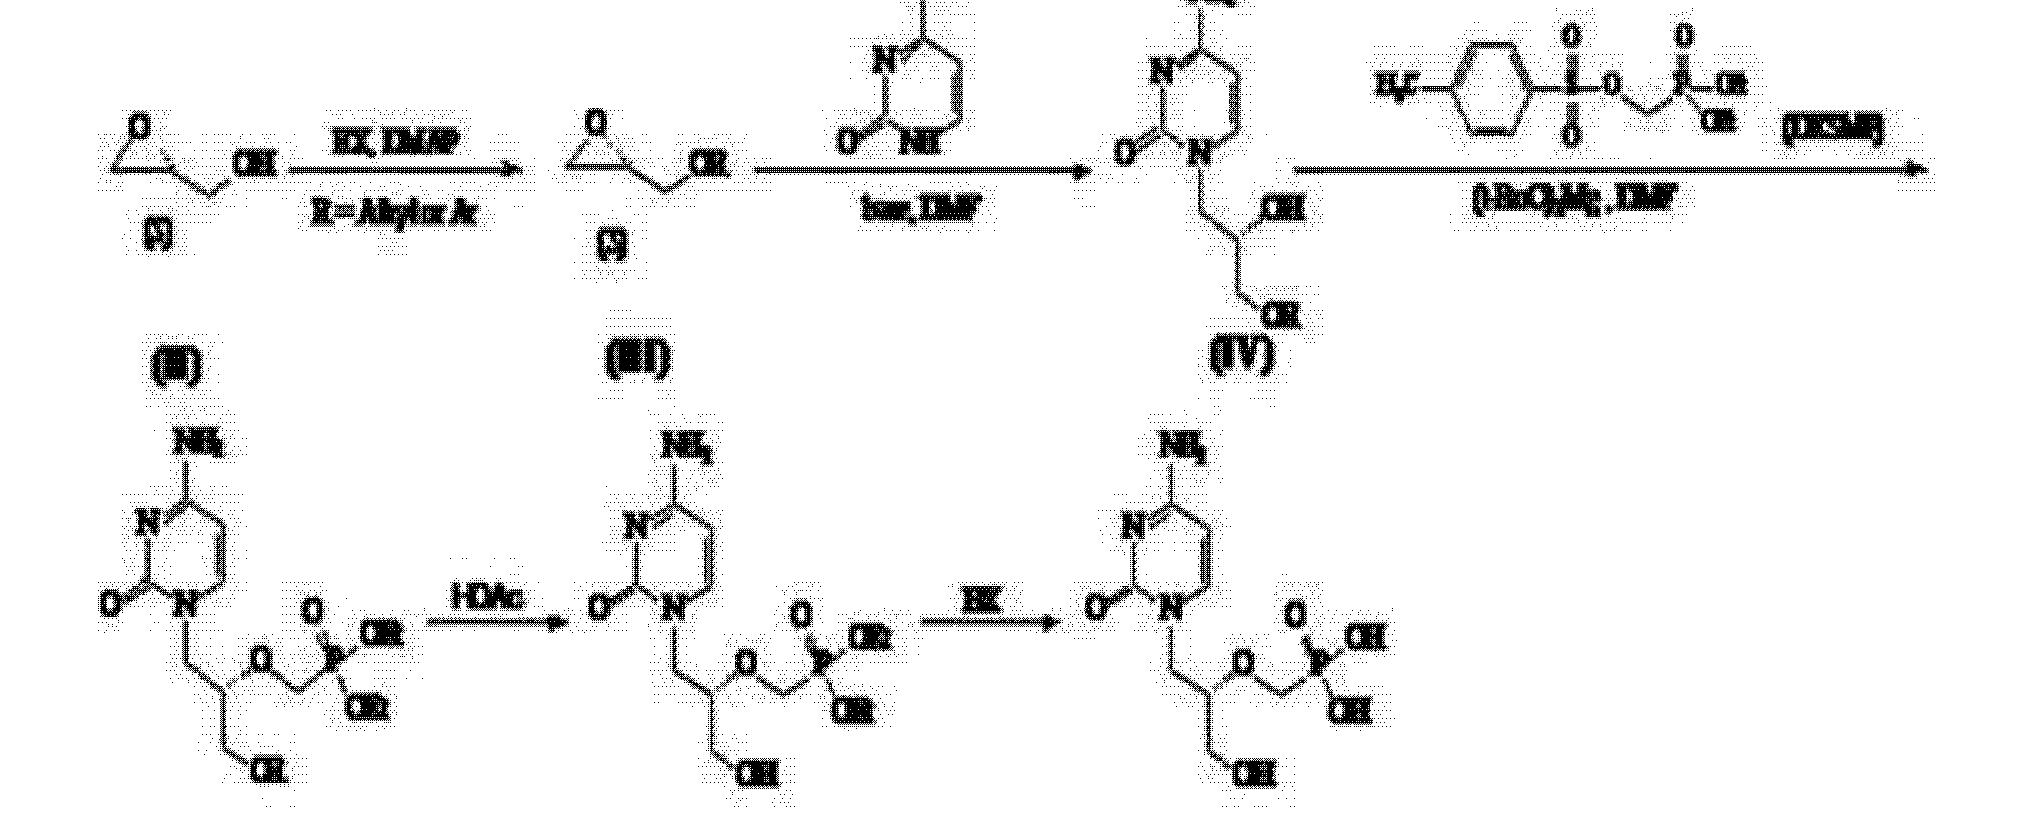 Levofloxacin hemihydrate usp 35 monograph.doc - Figure Cn102268040ad00112